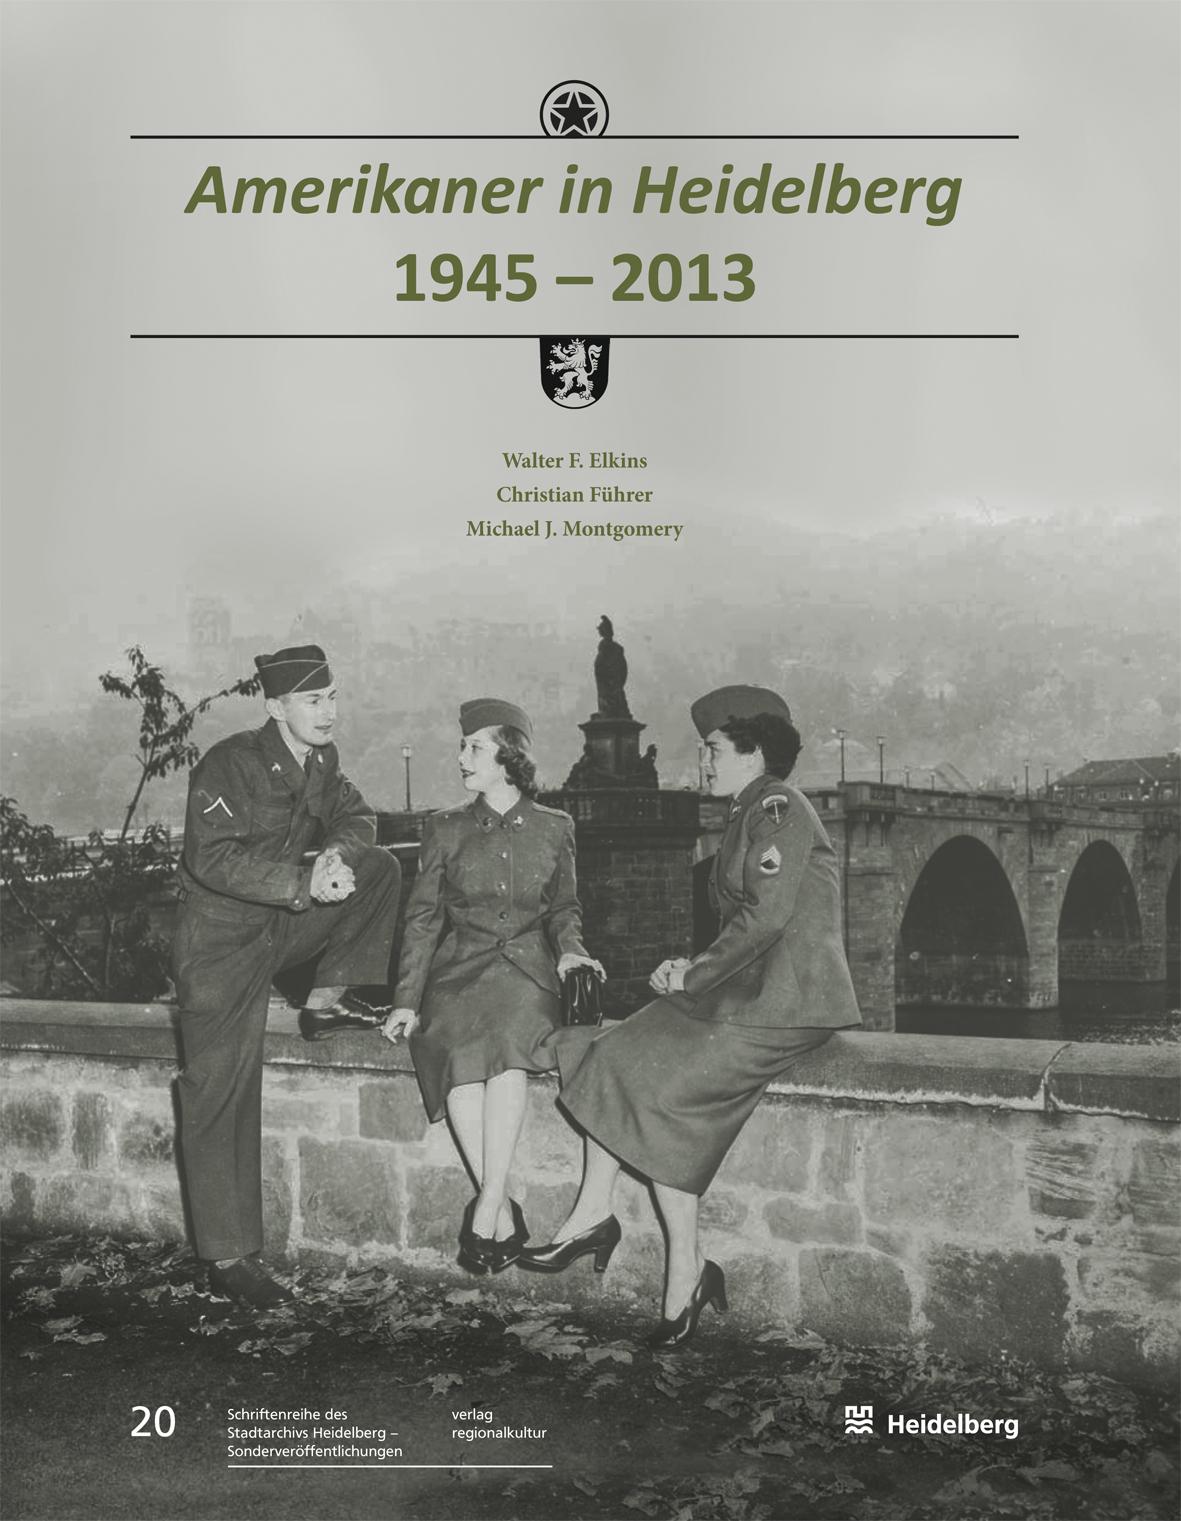 Foto: Stadtarchiv Heidelberg